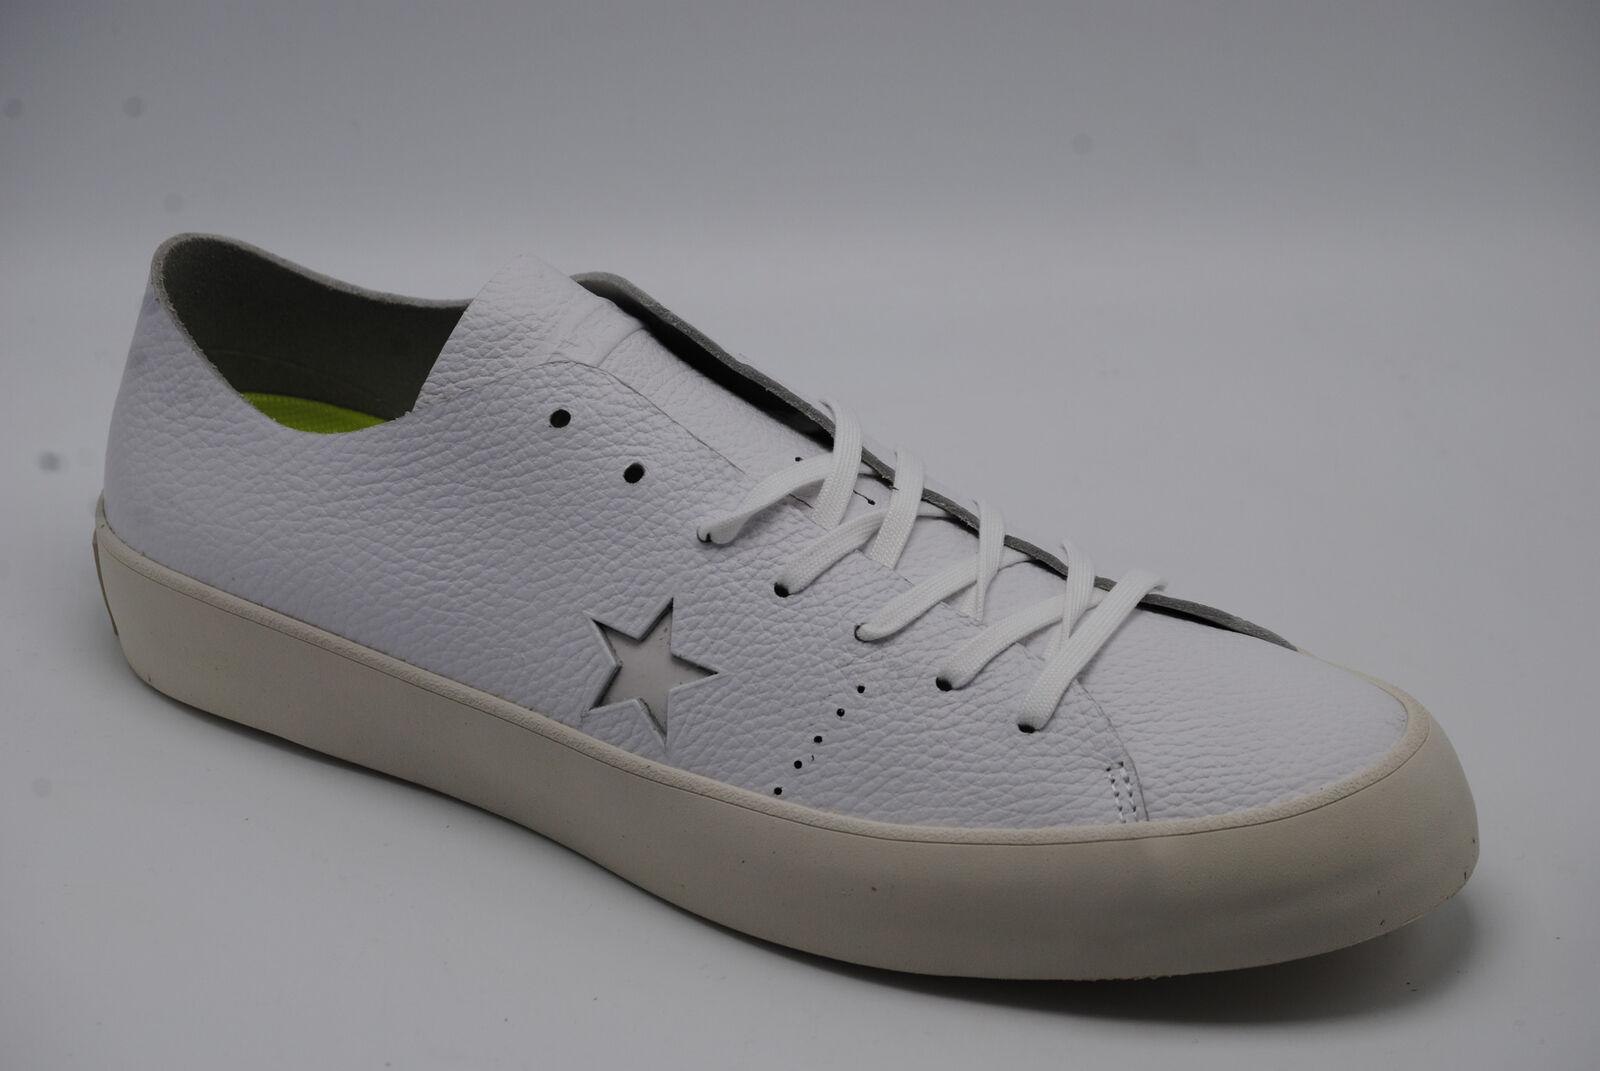 a4bcbb045ea4 Converse Cons One Star Prime Ox White Leather Low Shoes Sz 12 Mens ...